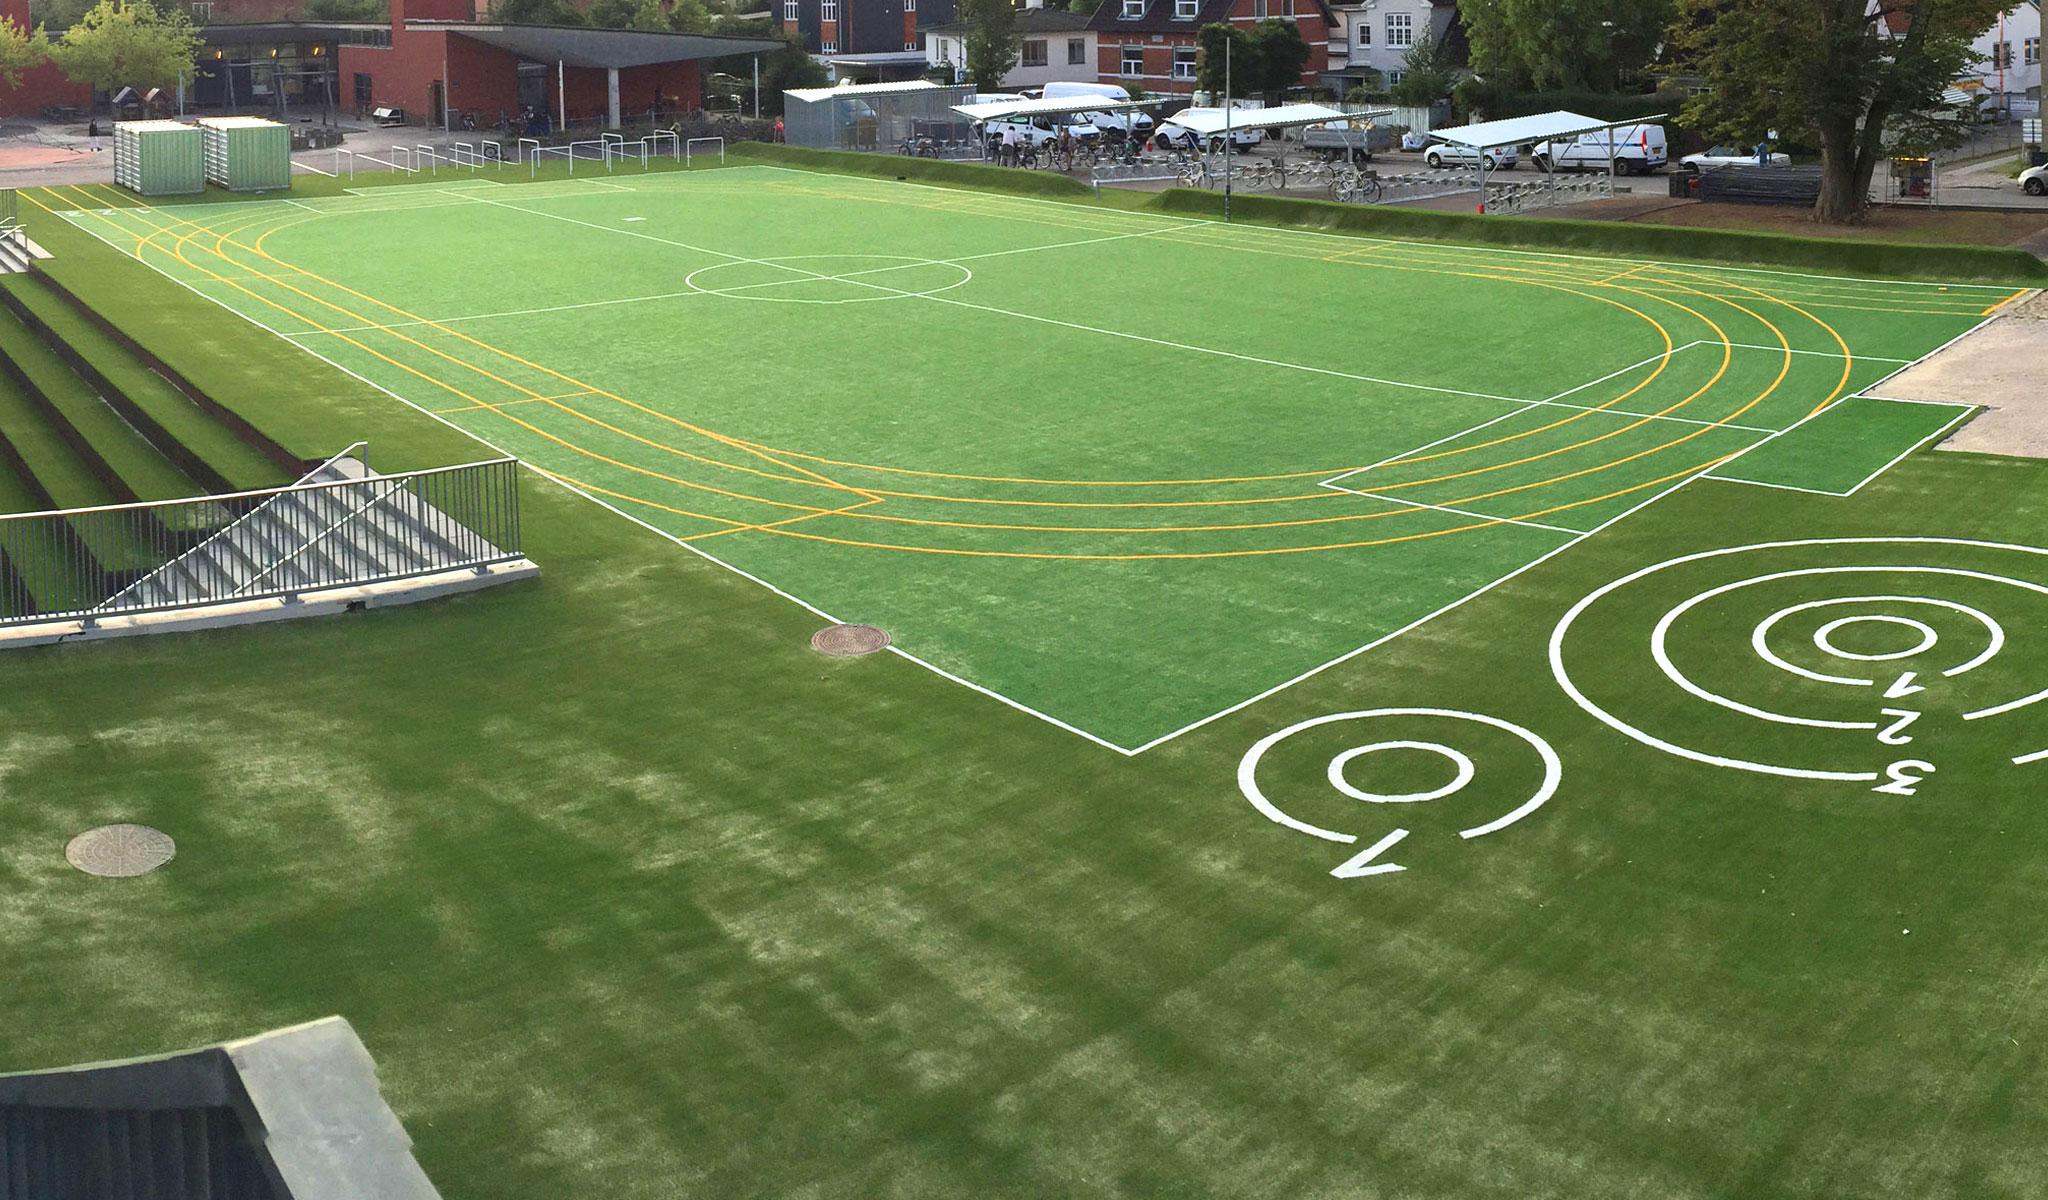 kunstgræs kirkebjerg skole unisport